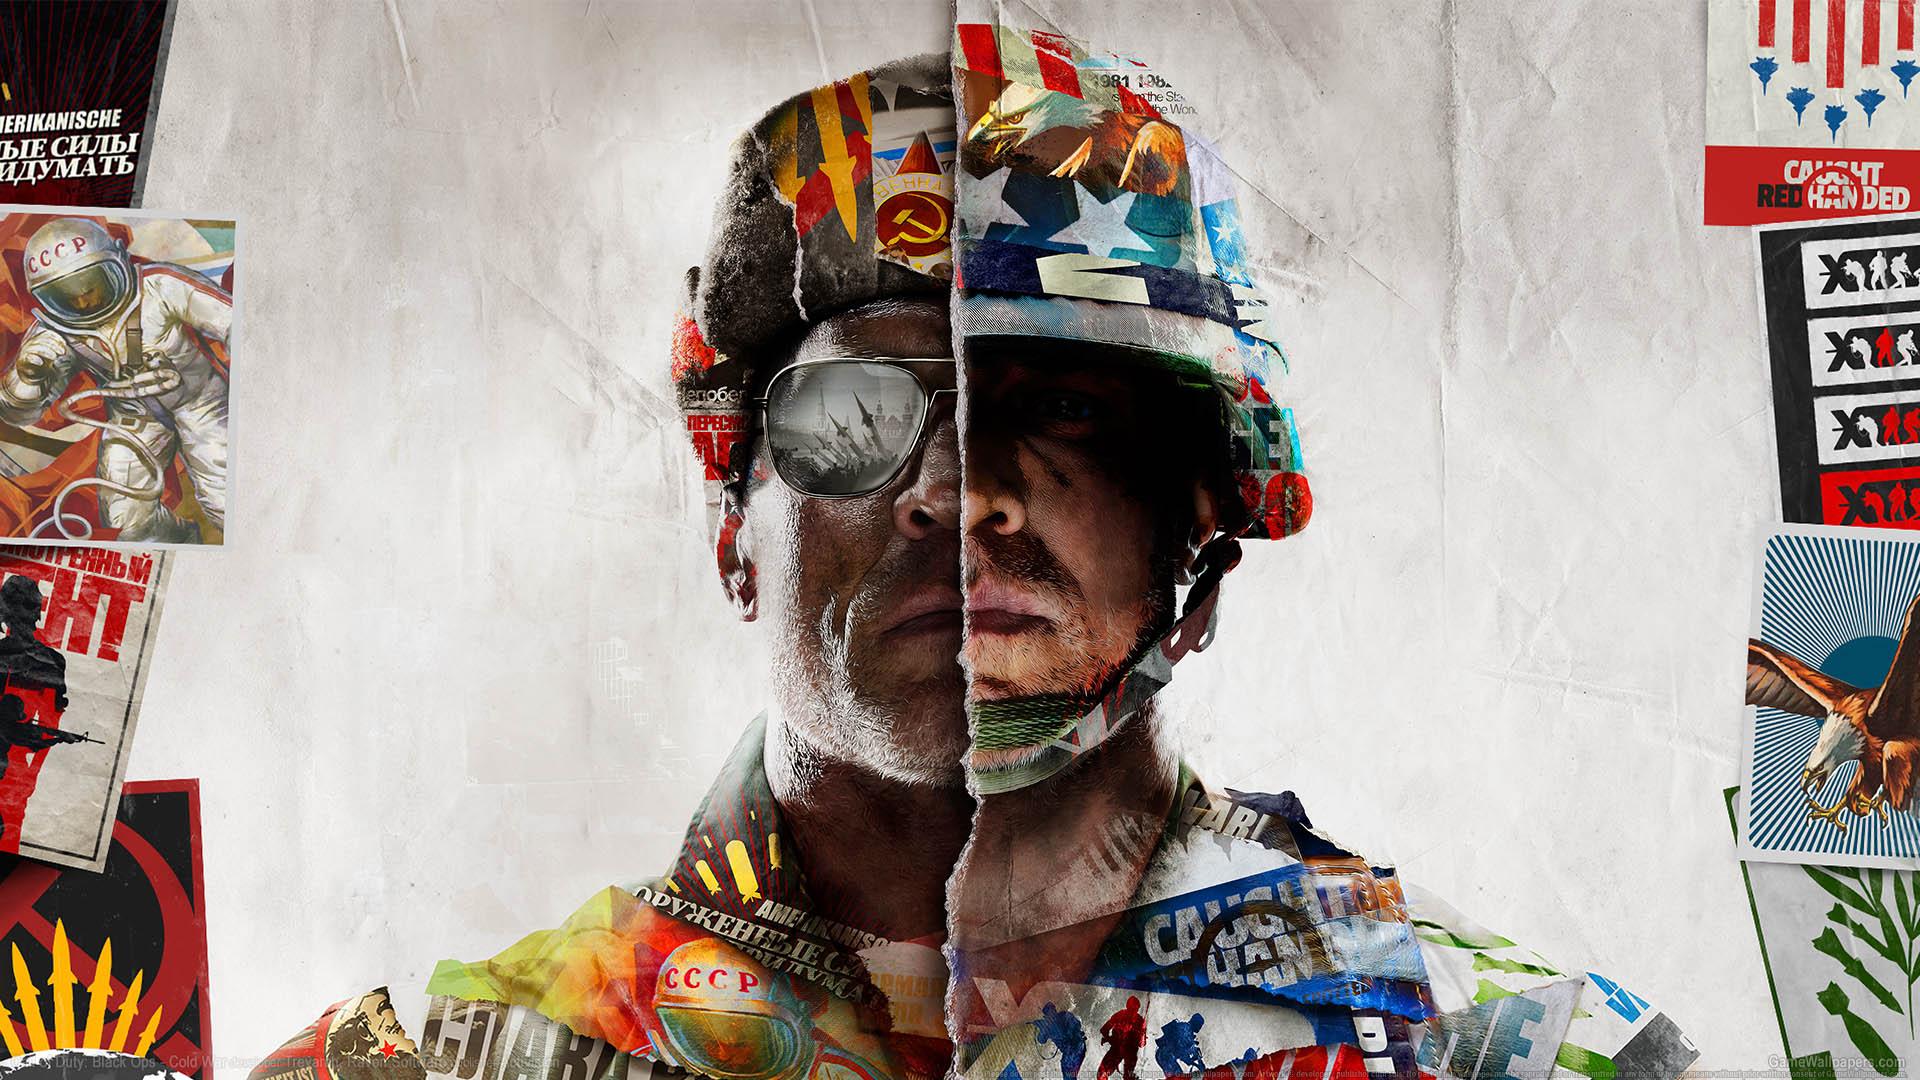 Call of Duty: Black Ops - Cold War wallpaper 01 1920x1080